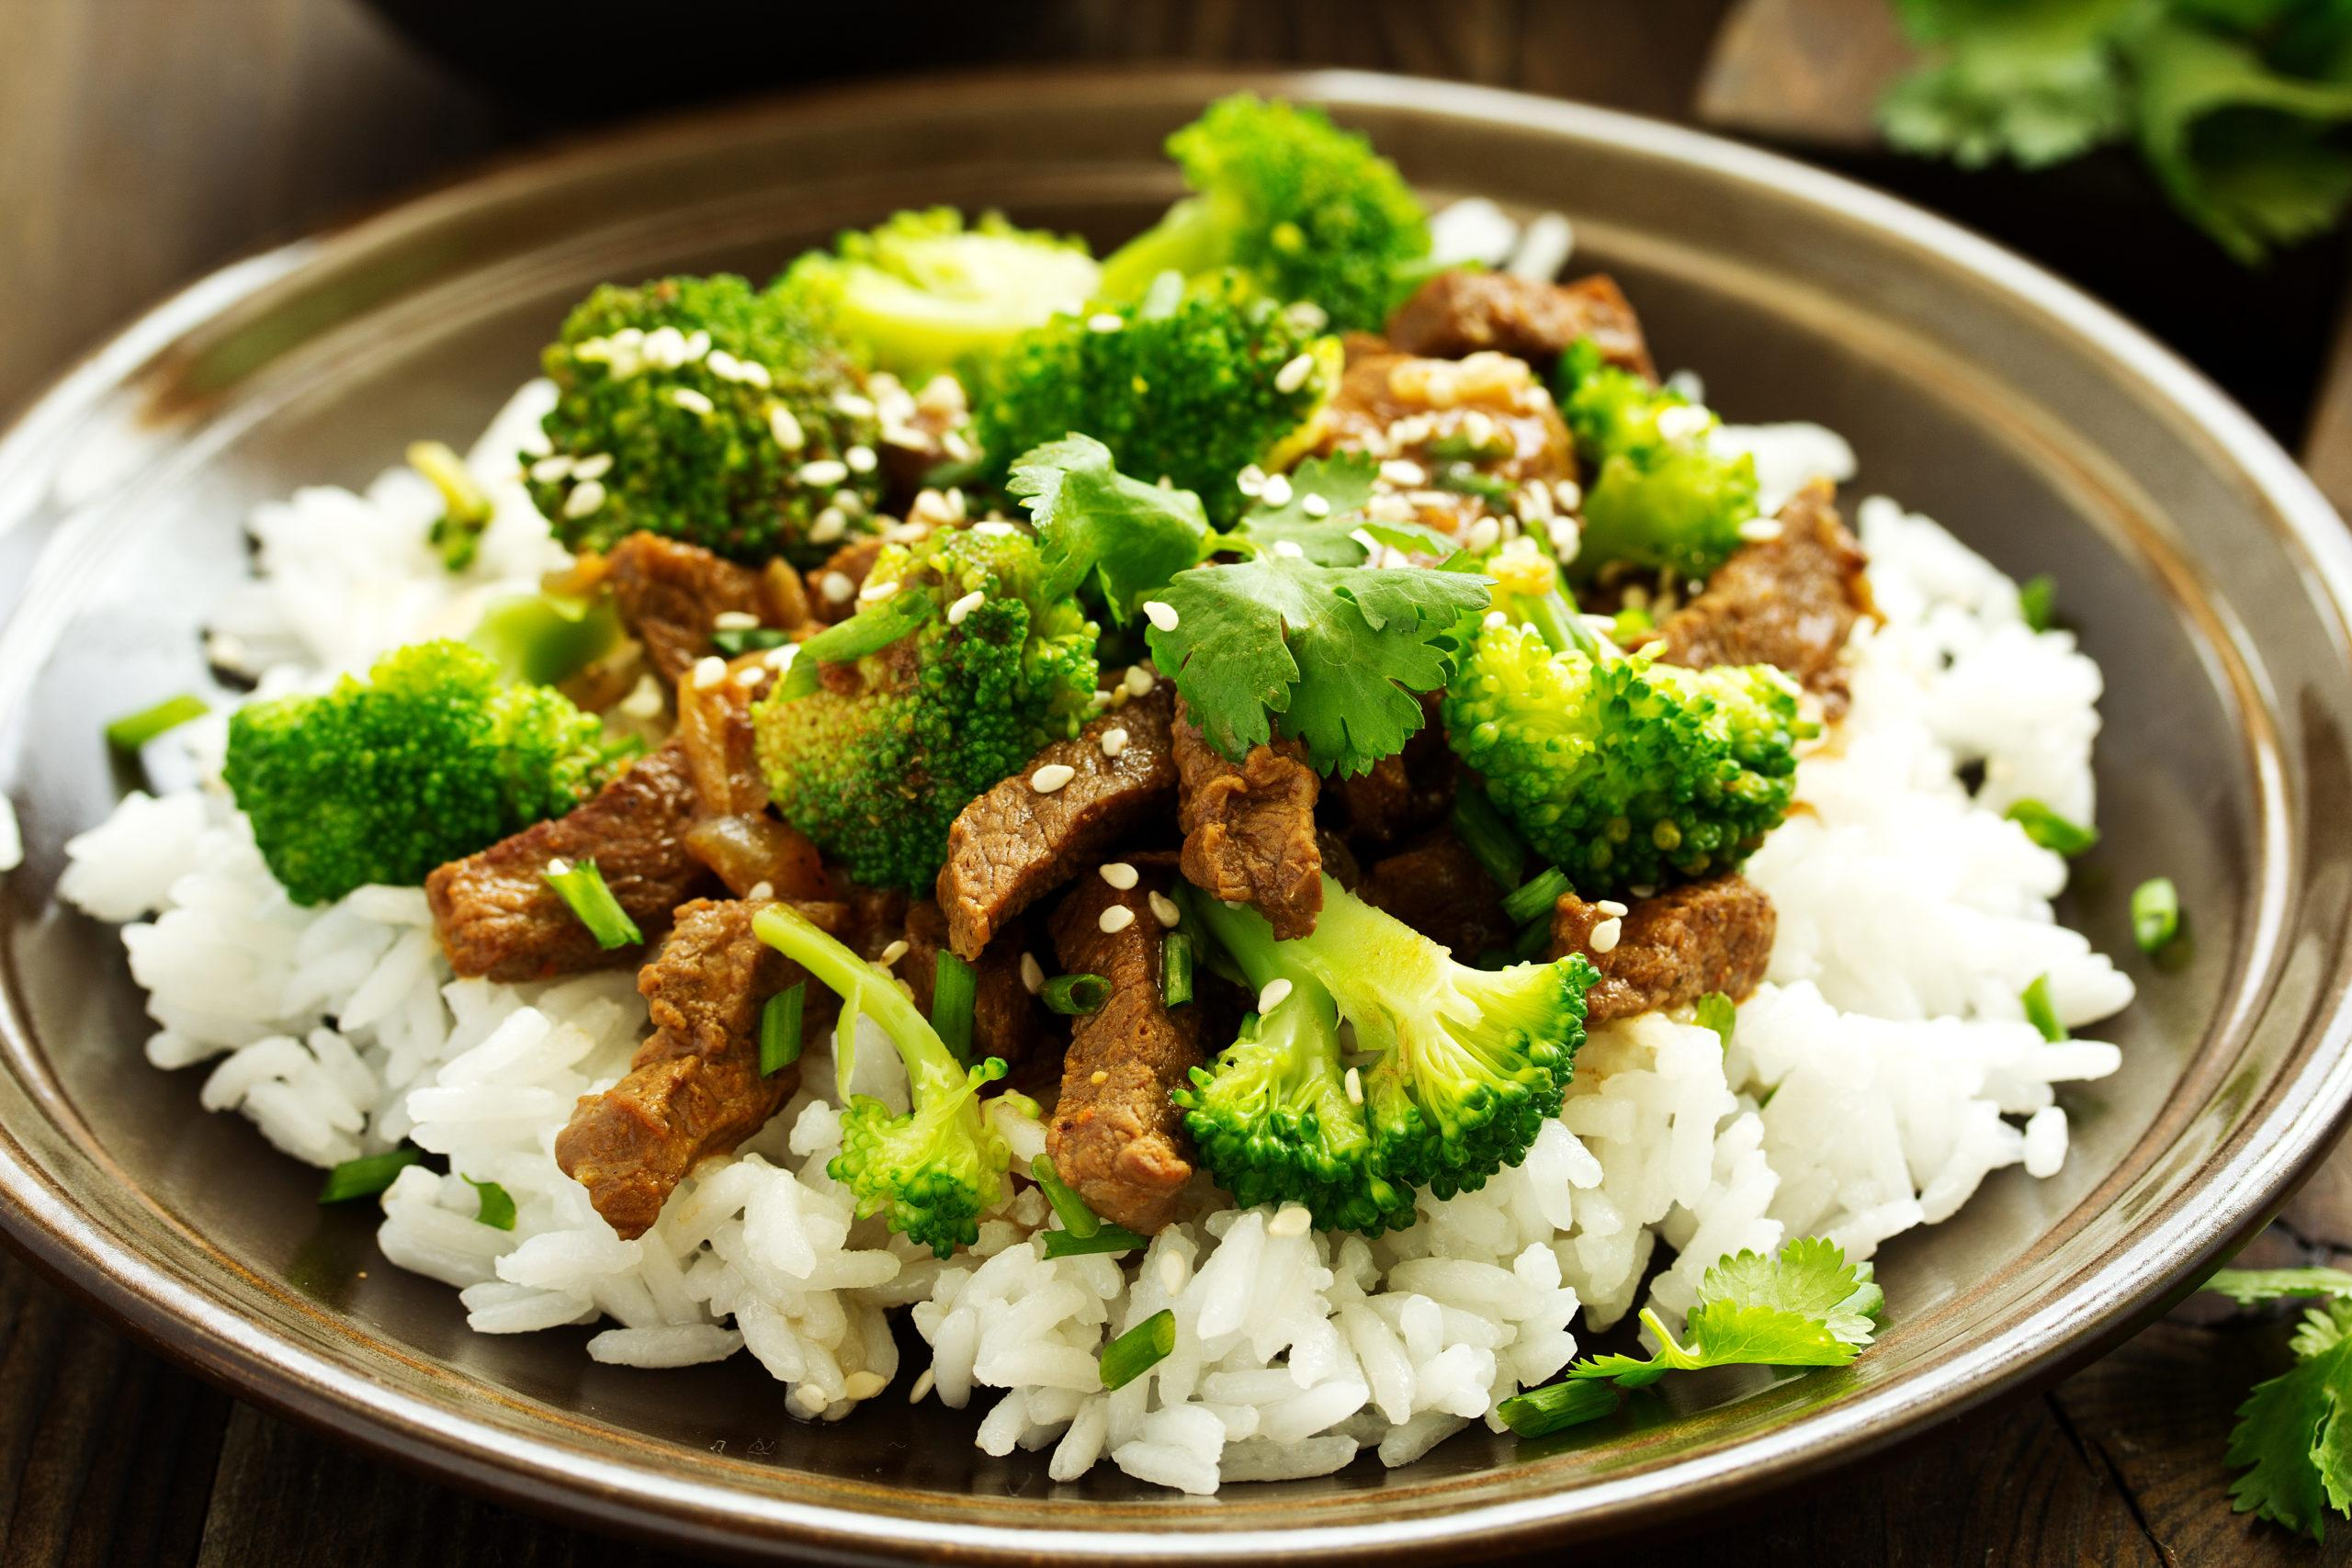 Marukan Apple Cider Vinegar Beef and Broccoli